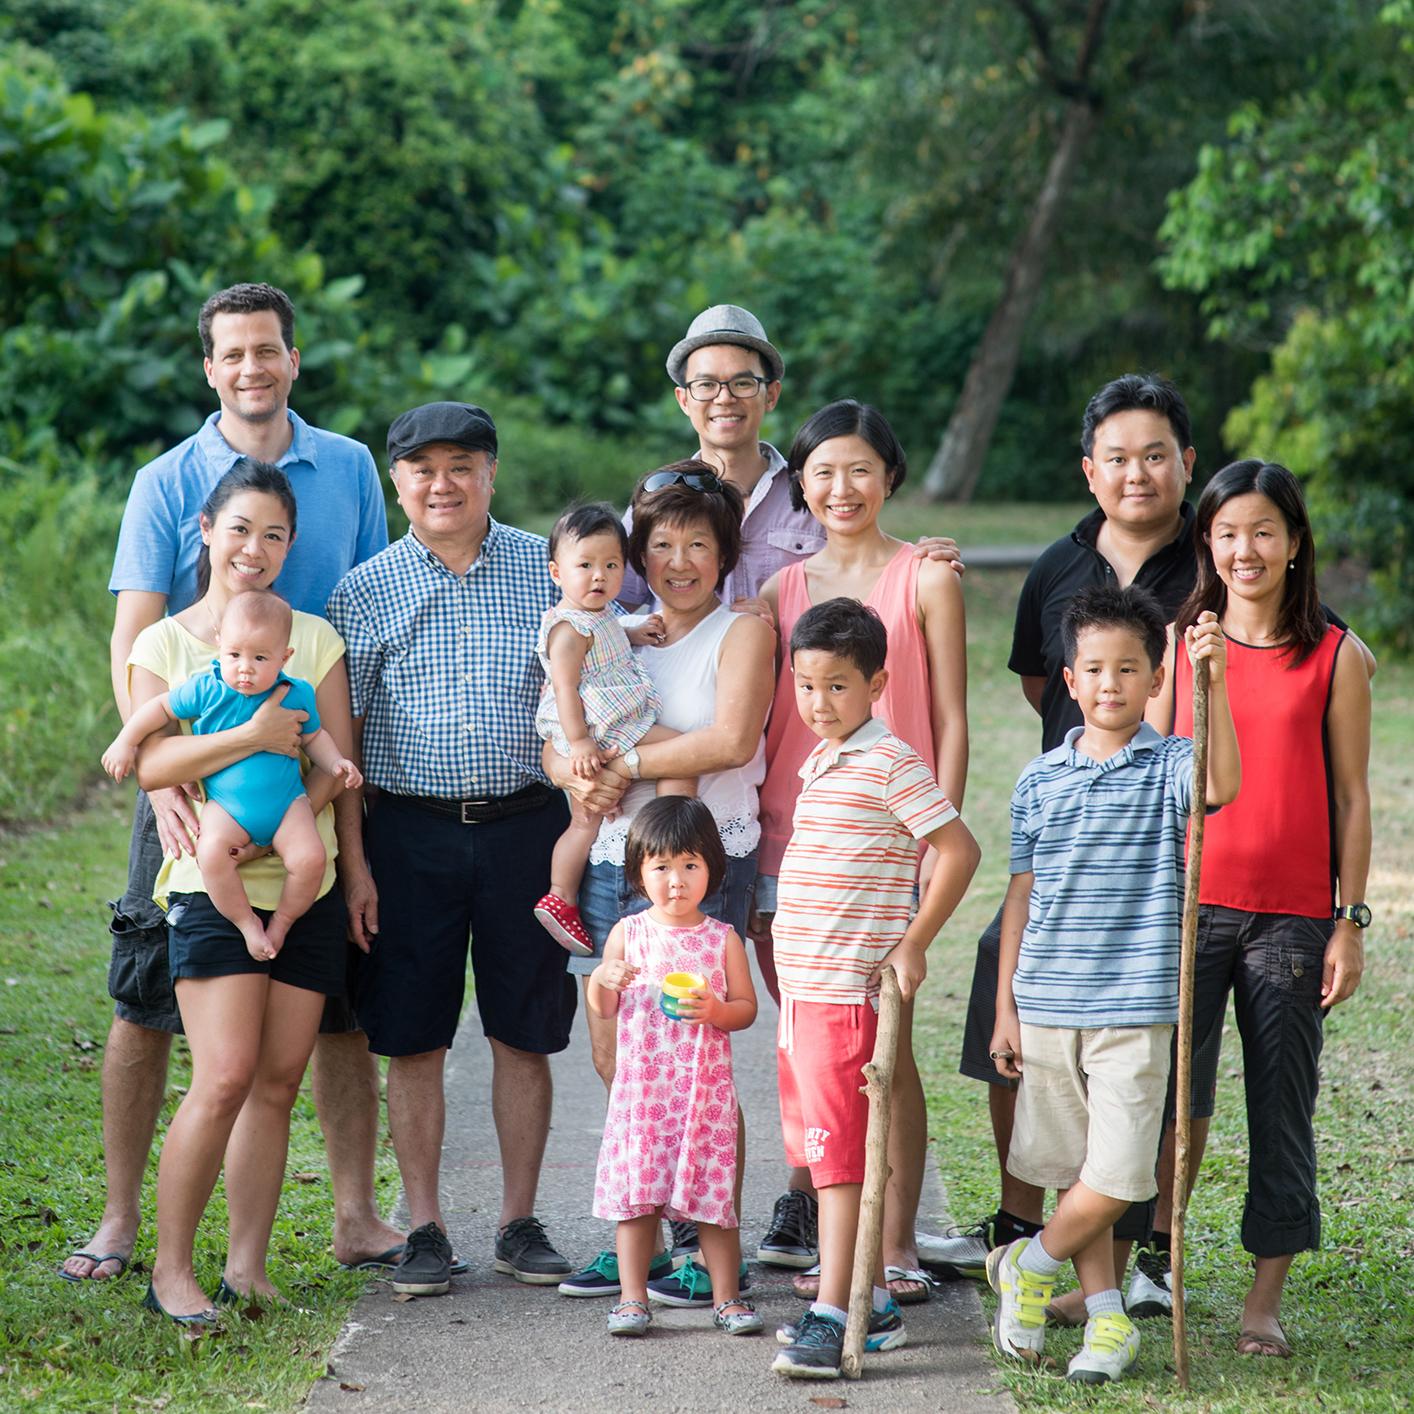 big-family-outdoor-shoot-11